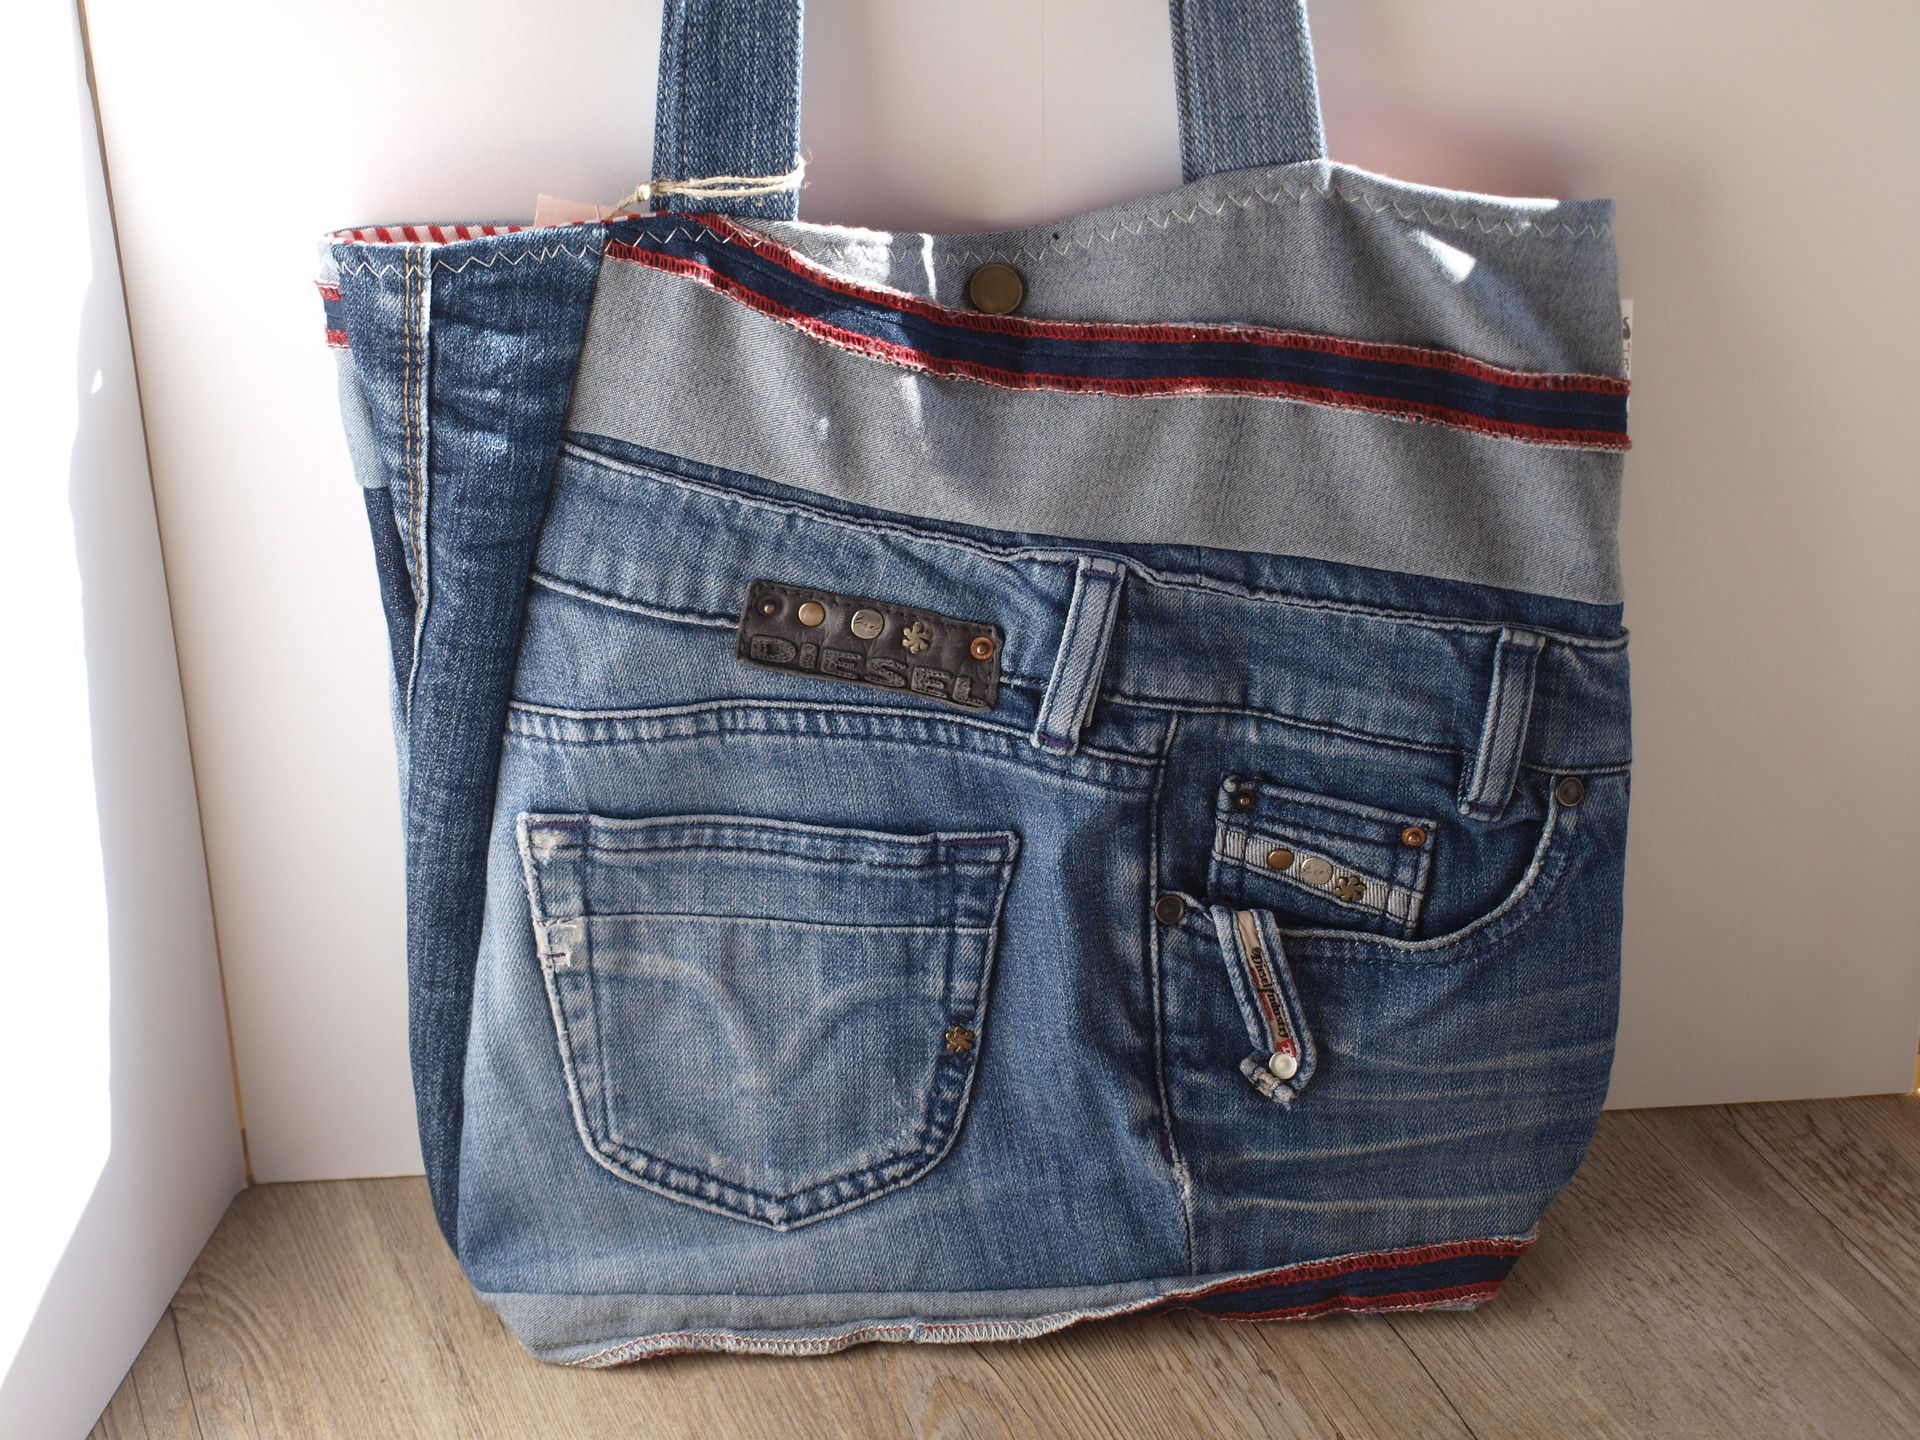 Sac en jean customisation fashion designs - Sac a main en jean ...